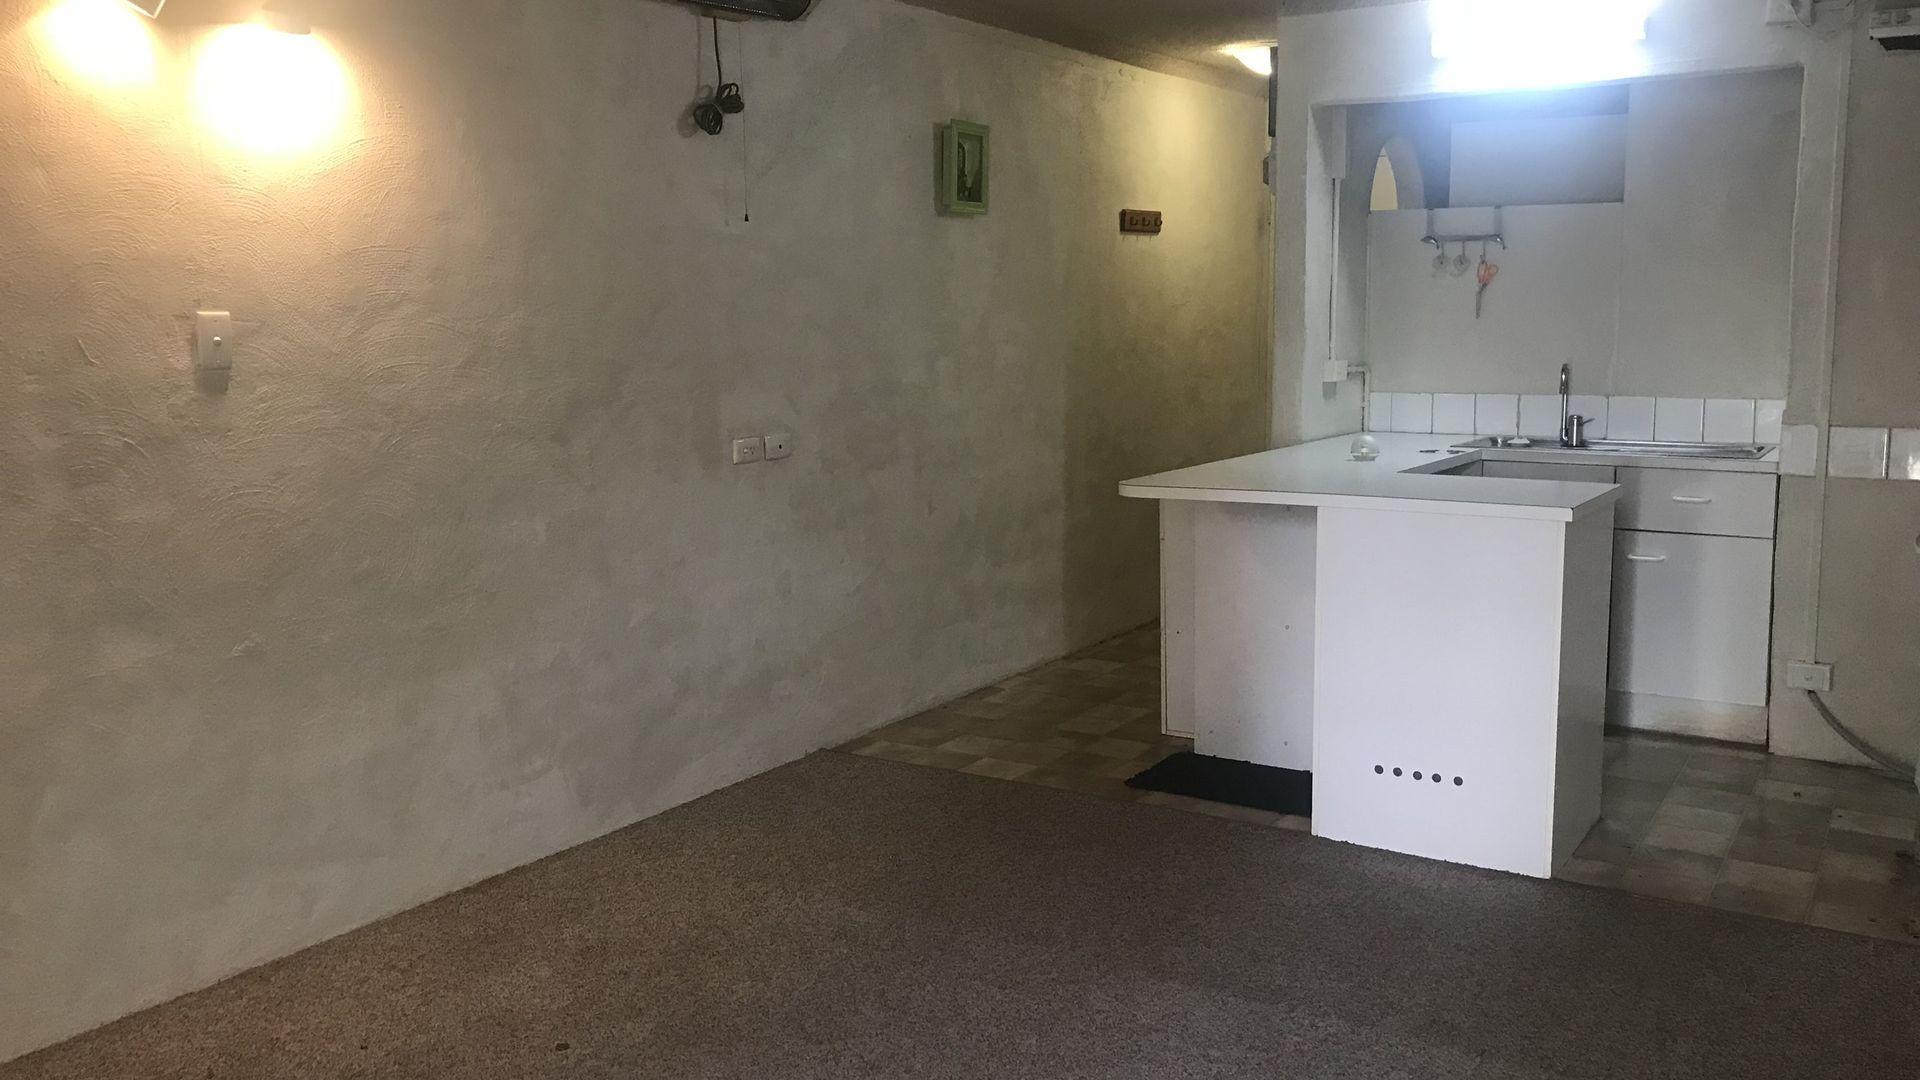 37/98 Mandurah Tce, Mandurah WA 6210, Image 2